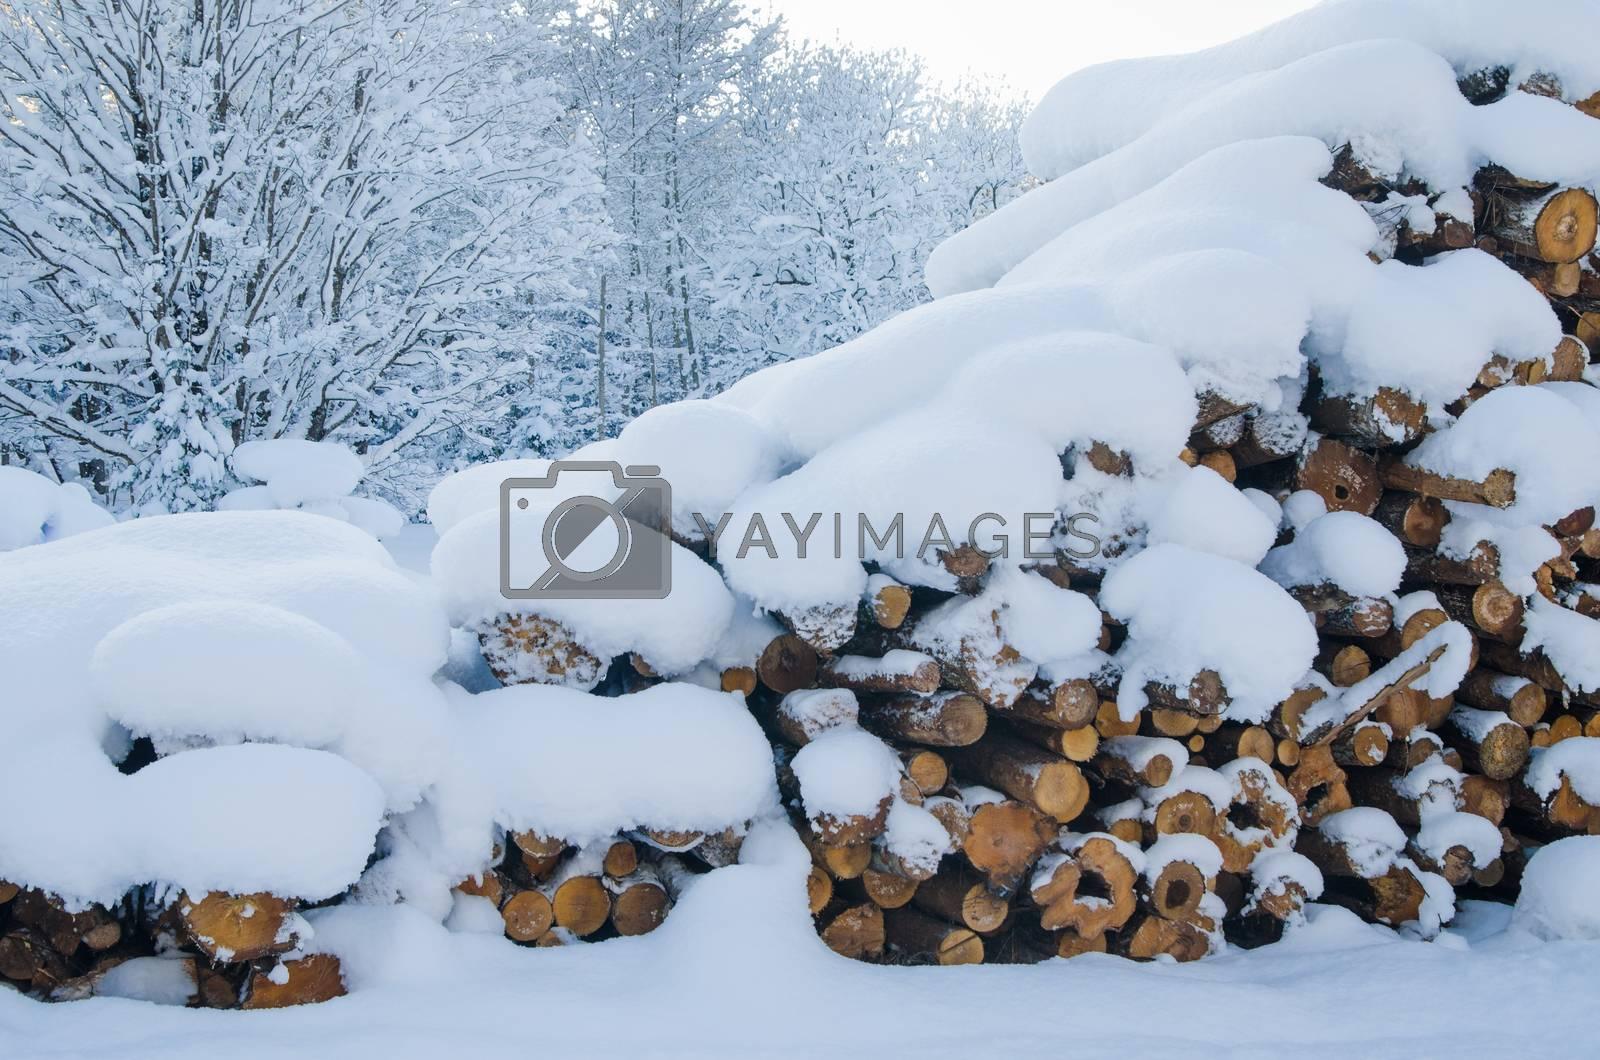 The cut logs in a winter wood under snowdrifts